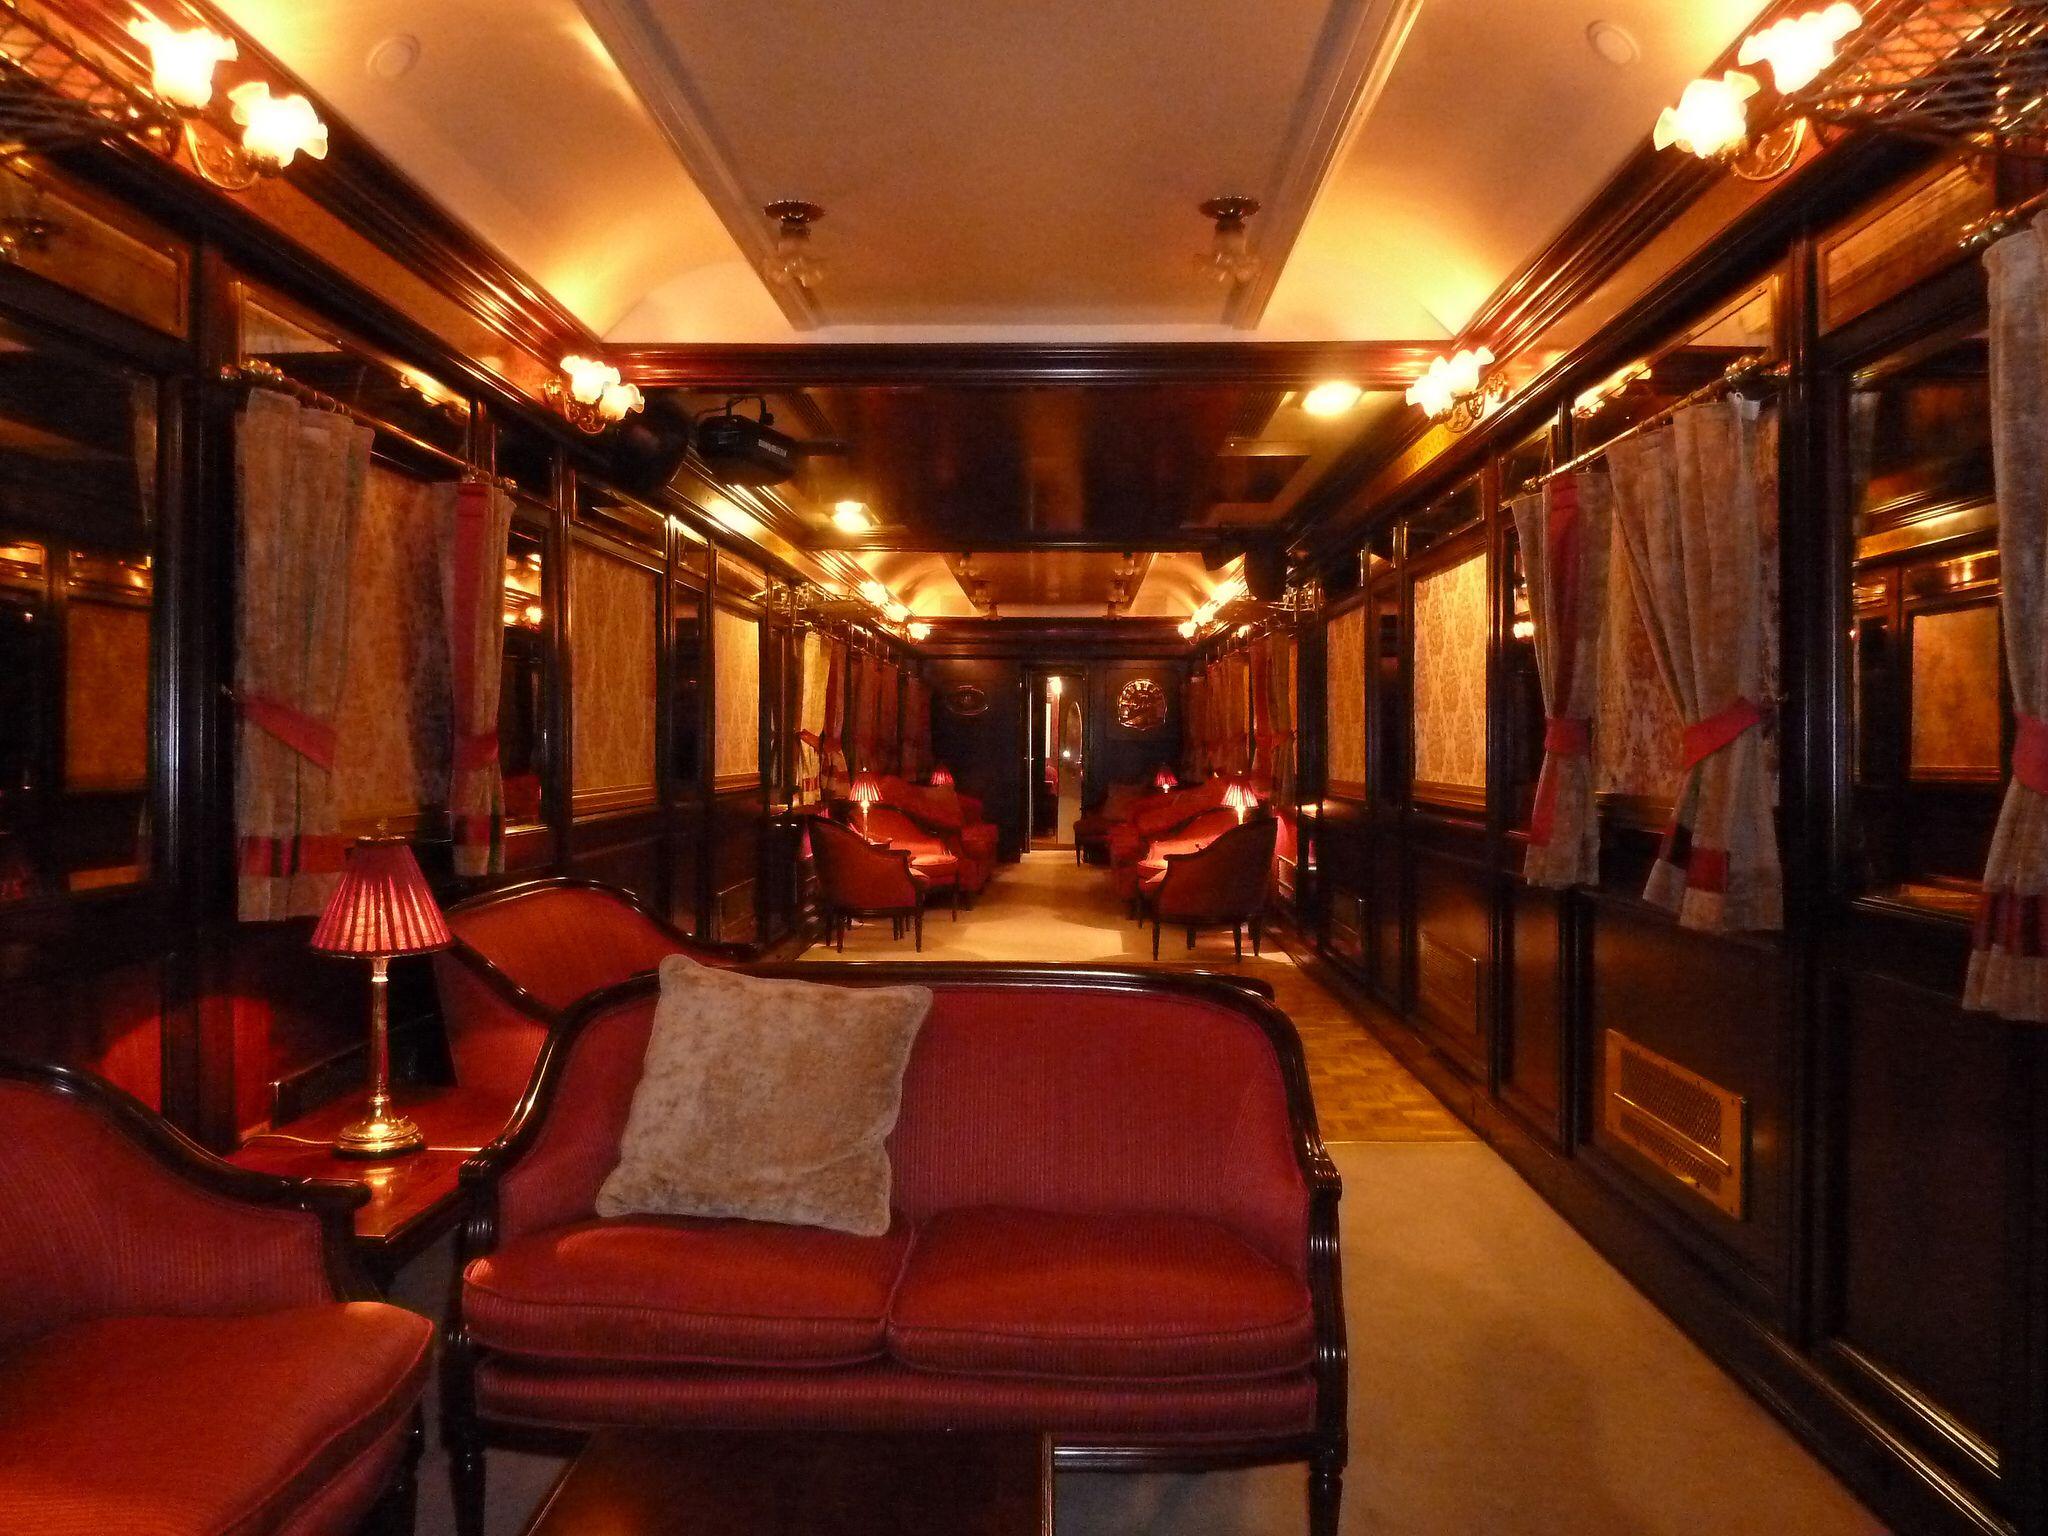 Al Andalus Luxury Train In Spain Luxury Train Train Travel Train